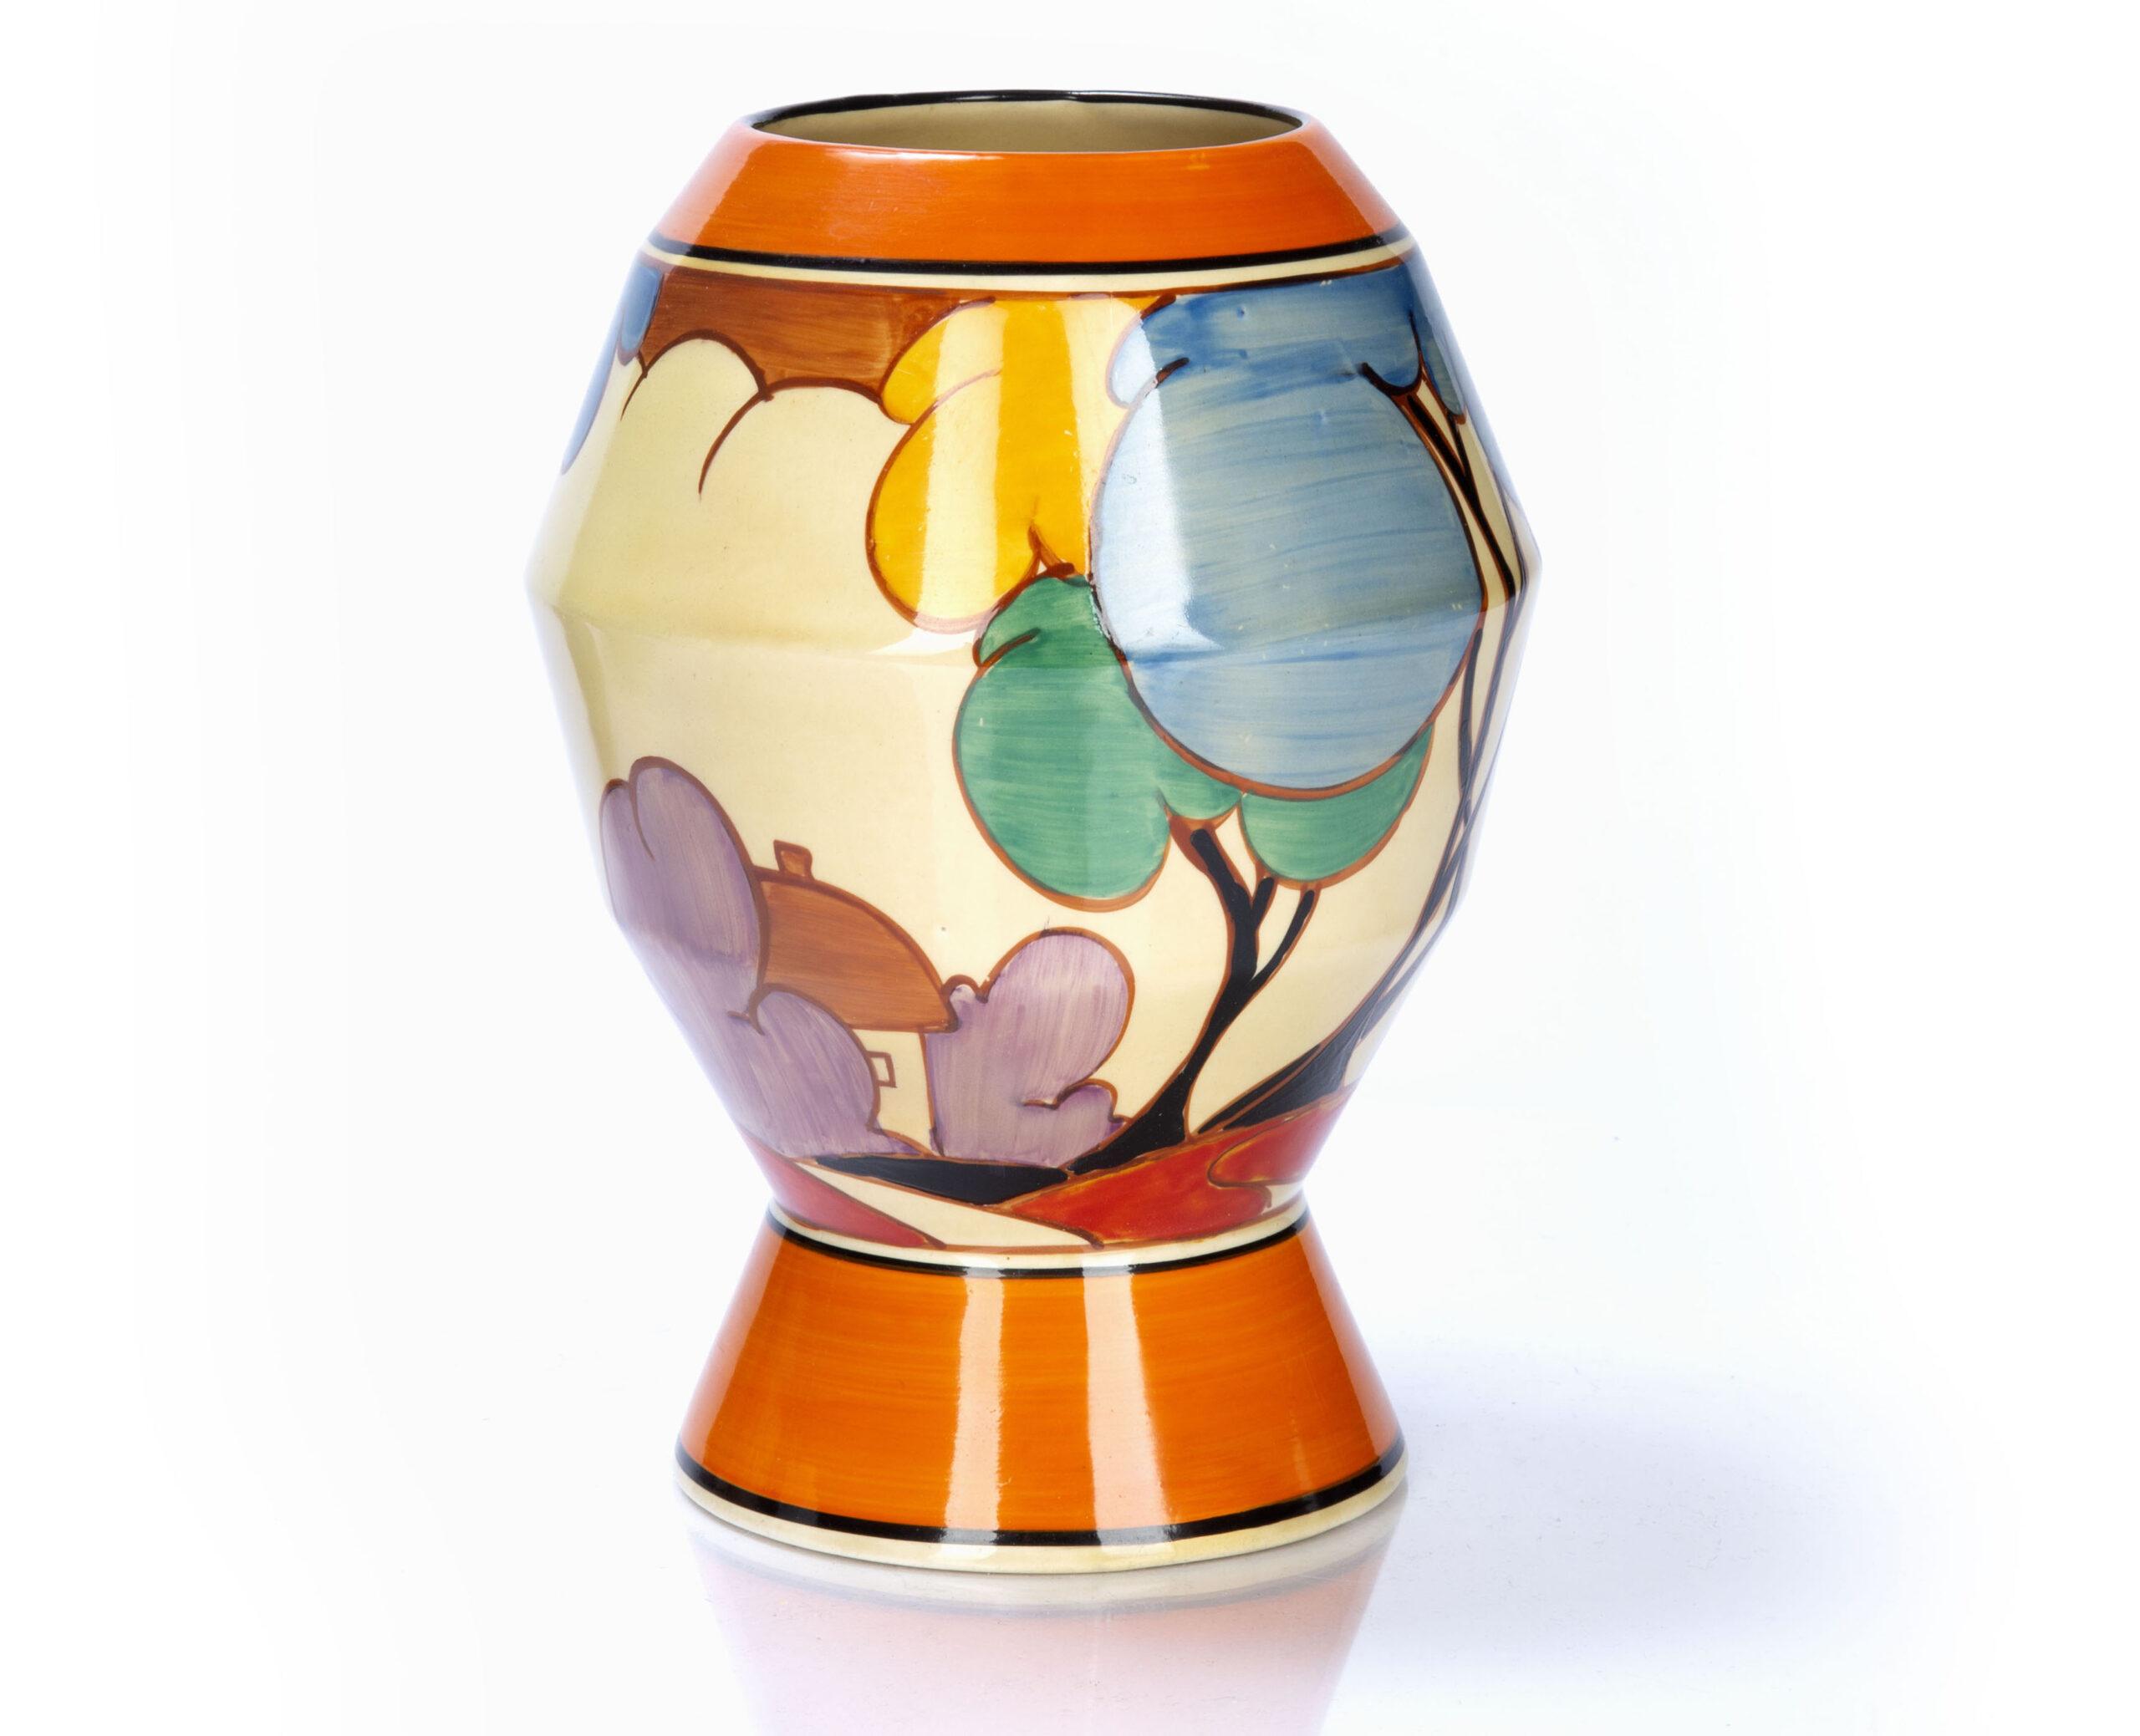 Clarice Cliff 'Autumn' shape 365 vase